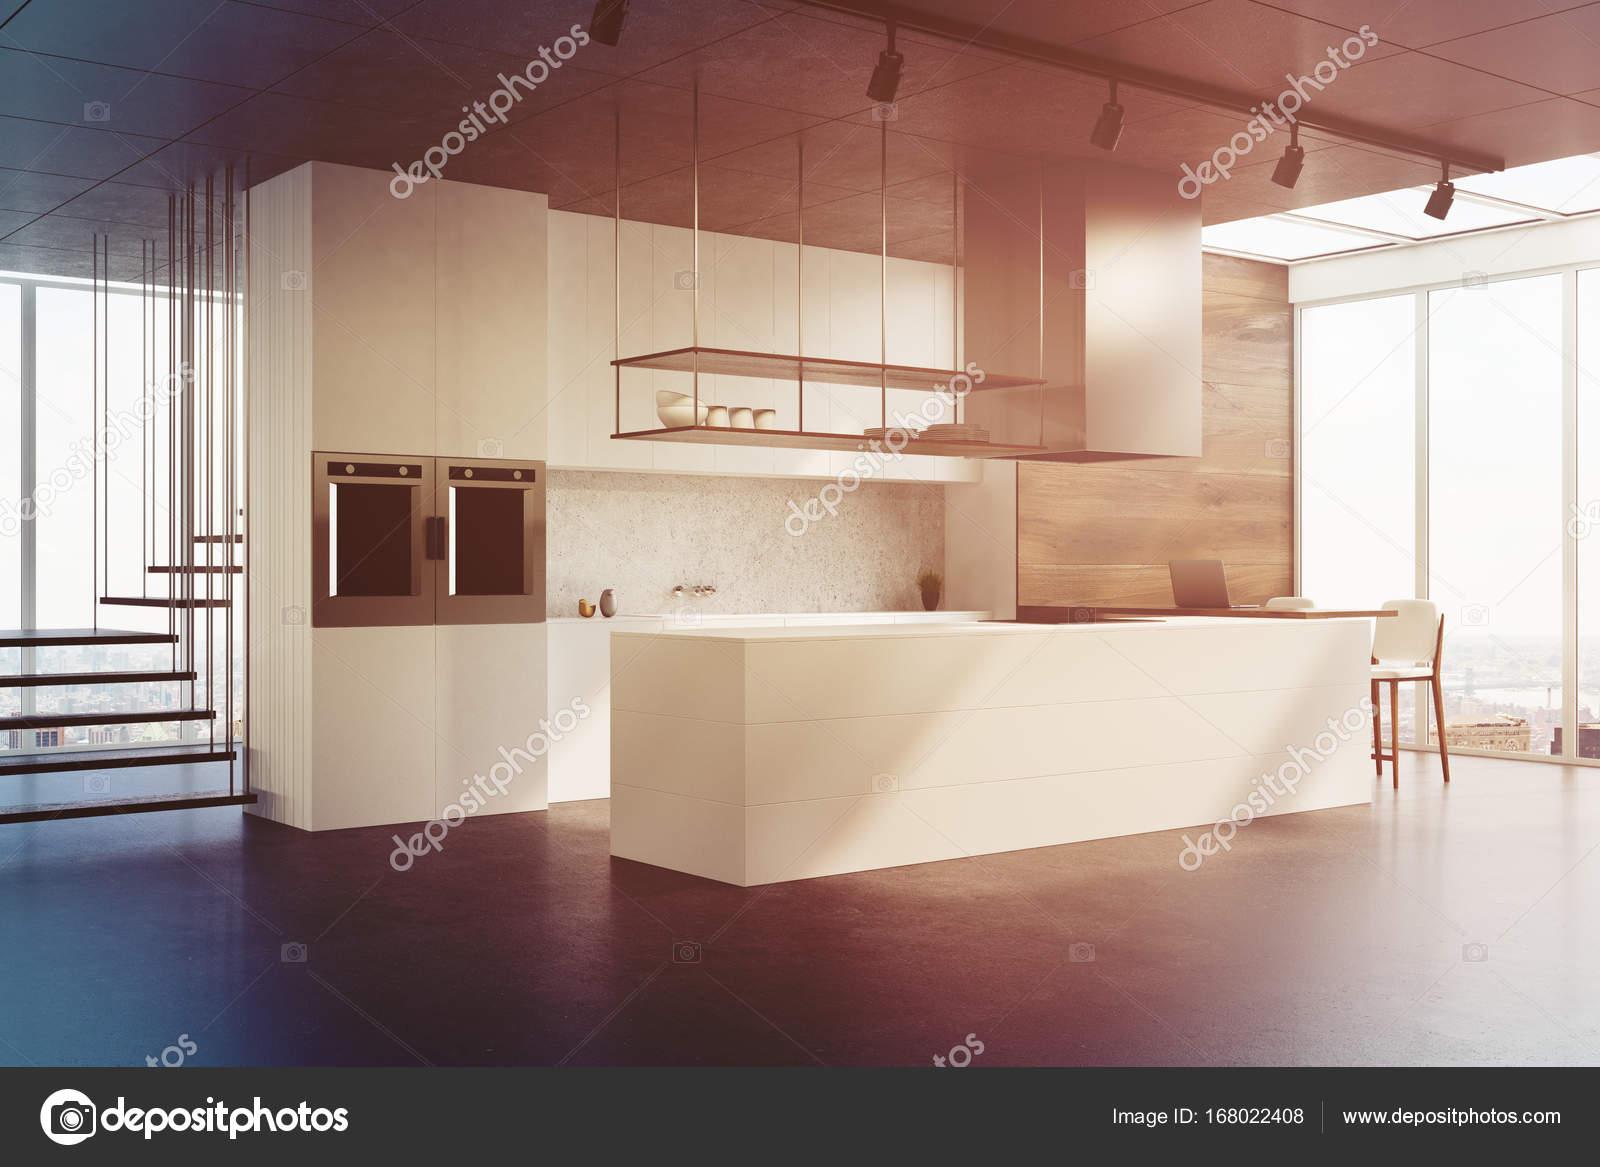 white kitchen backsplash decorative track lighting 白色的厨房柜台 侧面看定了调子 图库照片 c denisismagilov 168022408 一个白色的计数器 混凝土的后挡板 未来派的楼梯和混凝土地板的白色和木制厨房内部 侧面图 3d 渲染模拟了色调图像 照片作者denisismagilov